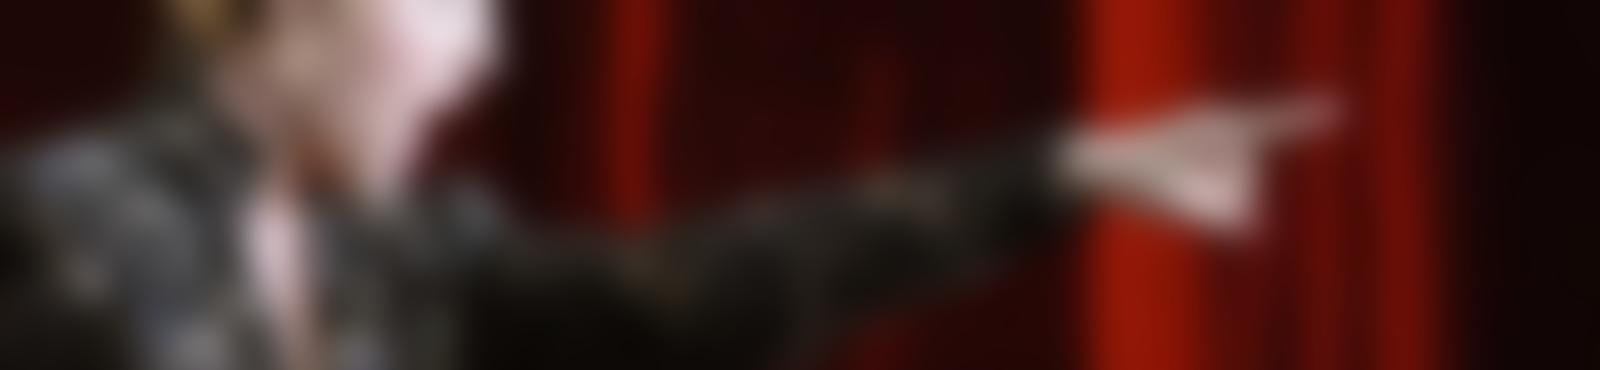 Blurred 9d55c9b2 d4e1 41aa b1cc bdcf149ce2c2